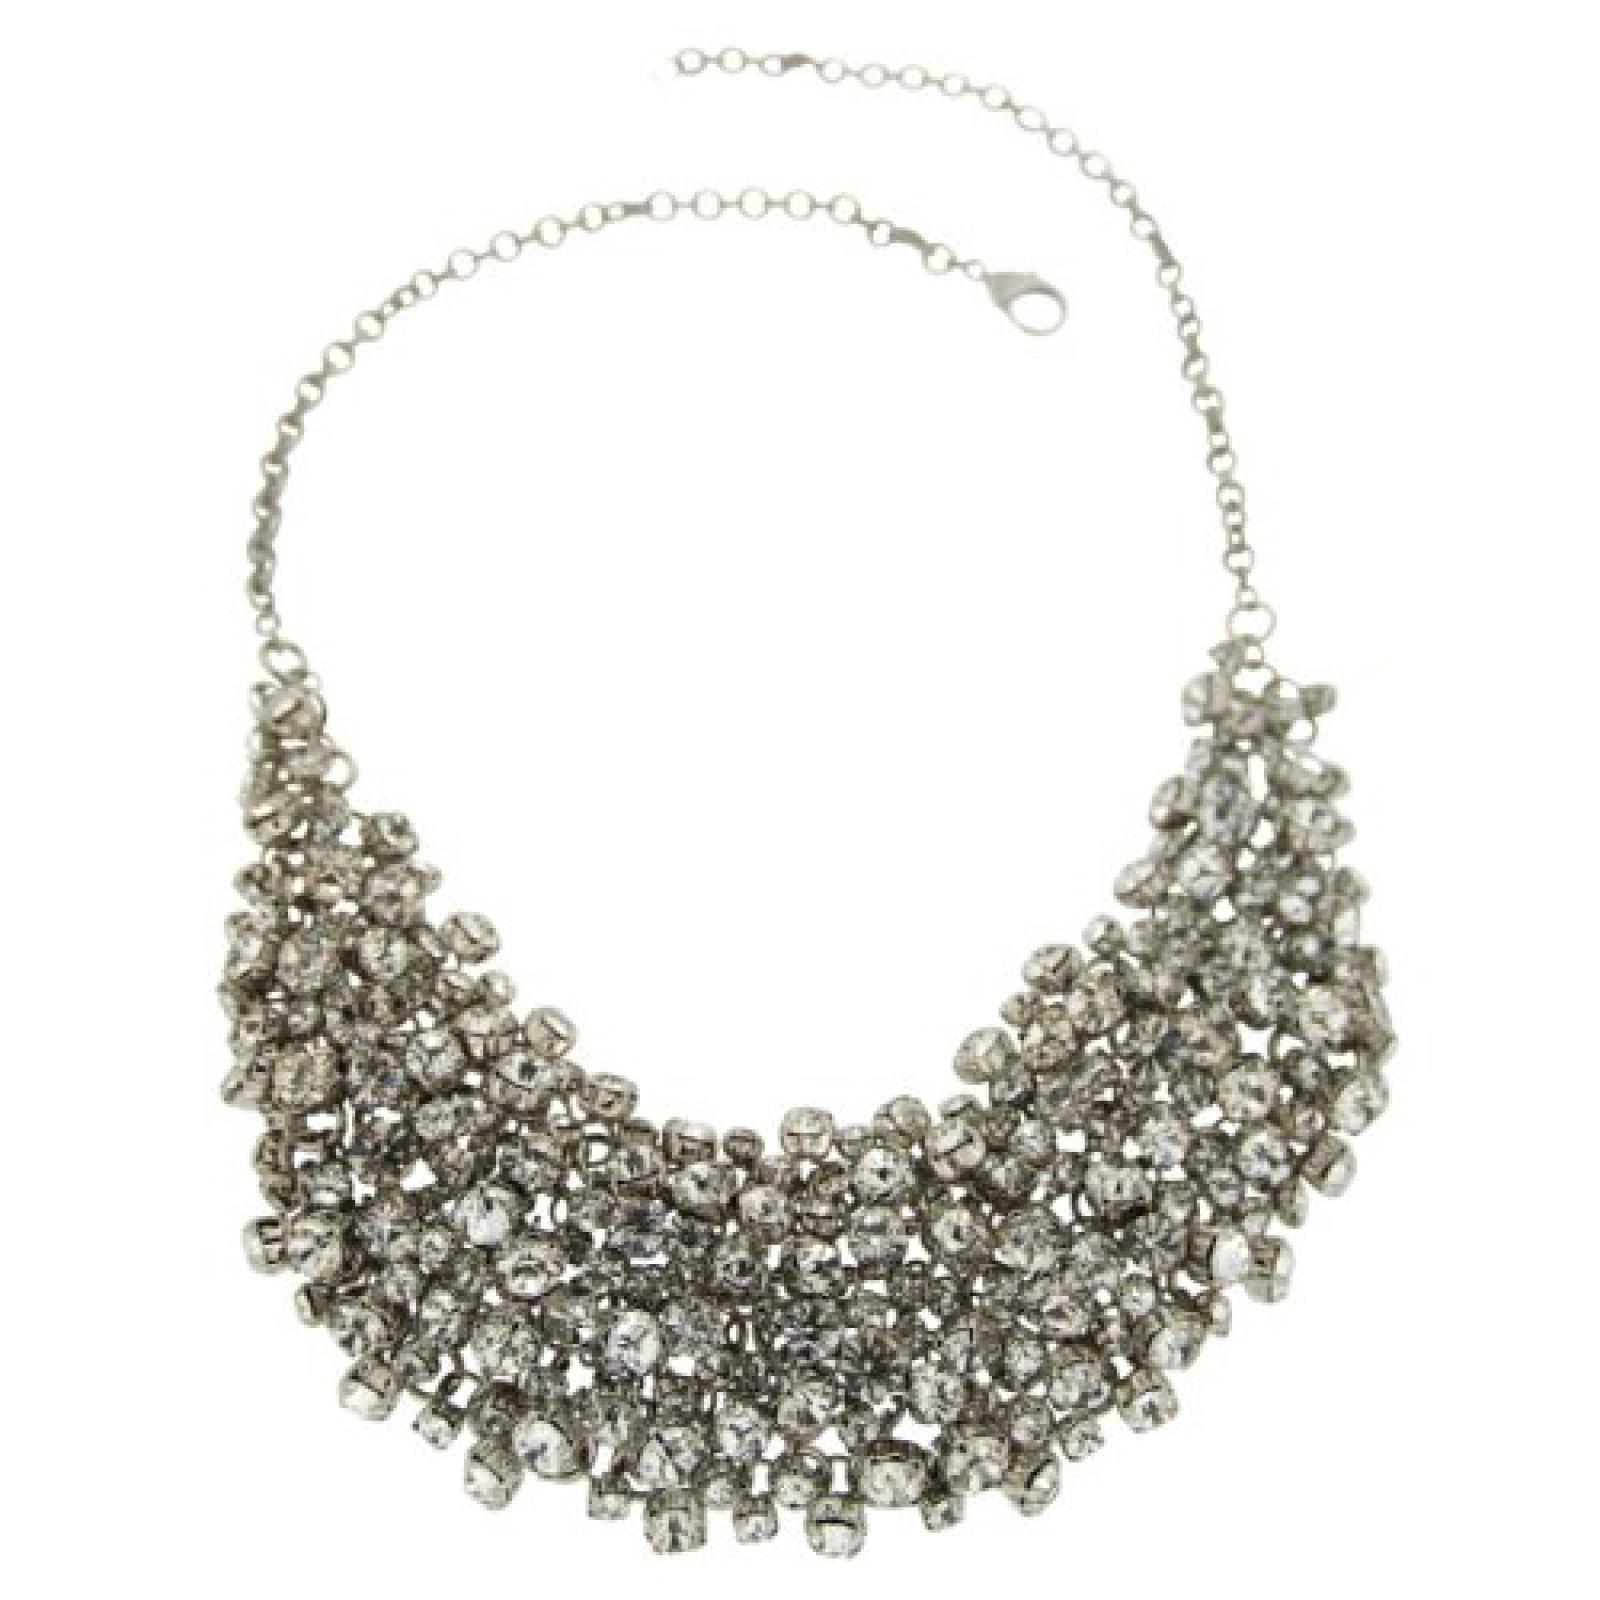 Sweet Deluxe Damen-Collier Josefine silber/kristall 50 cm 00206